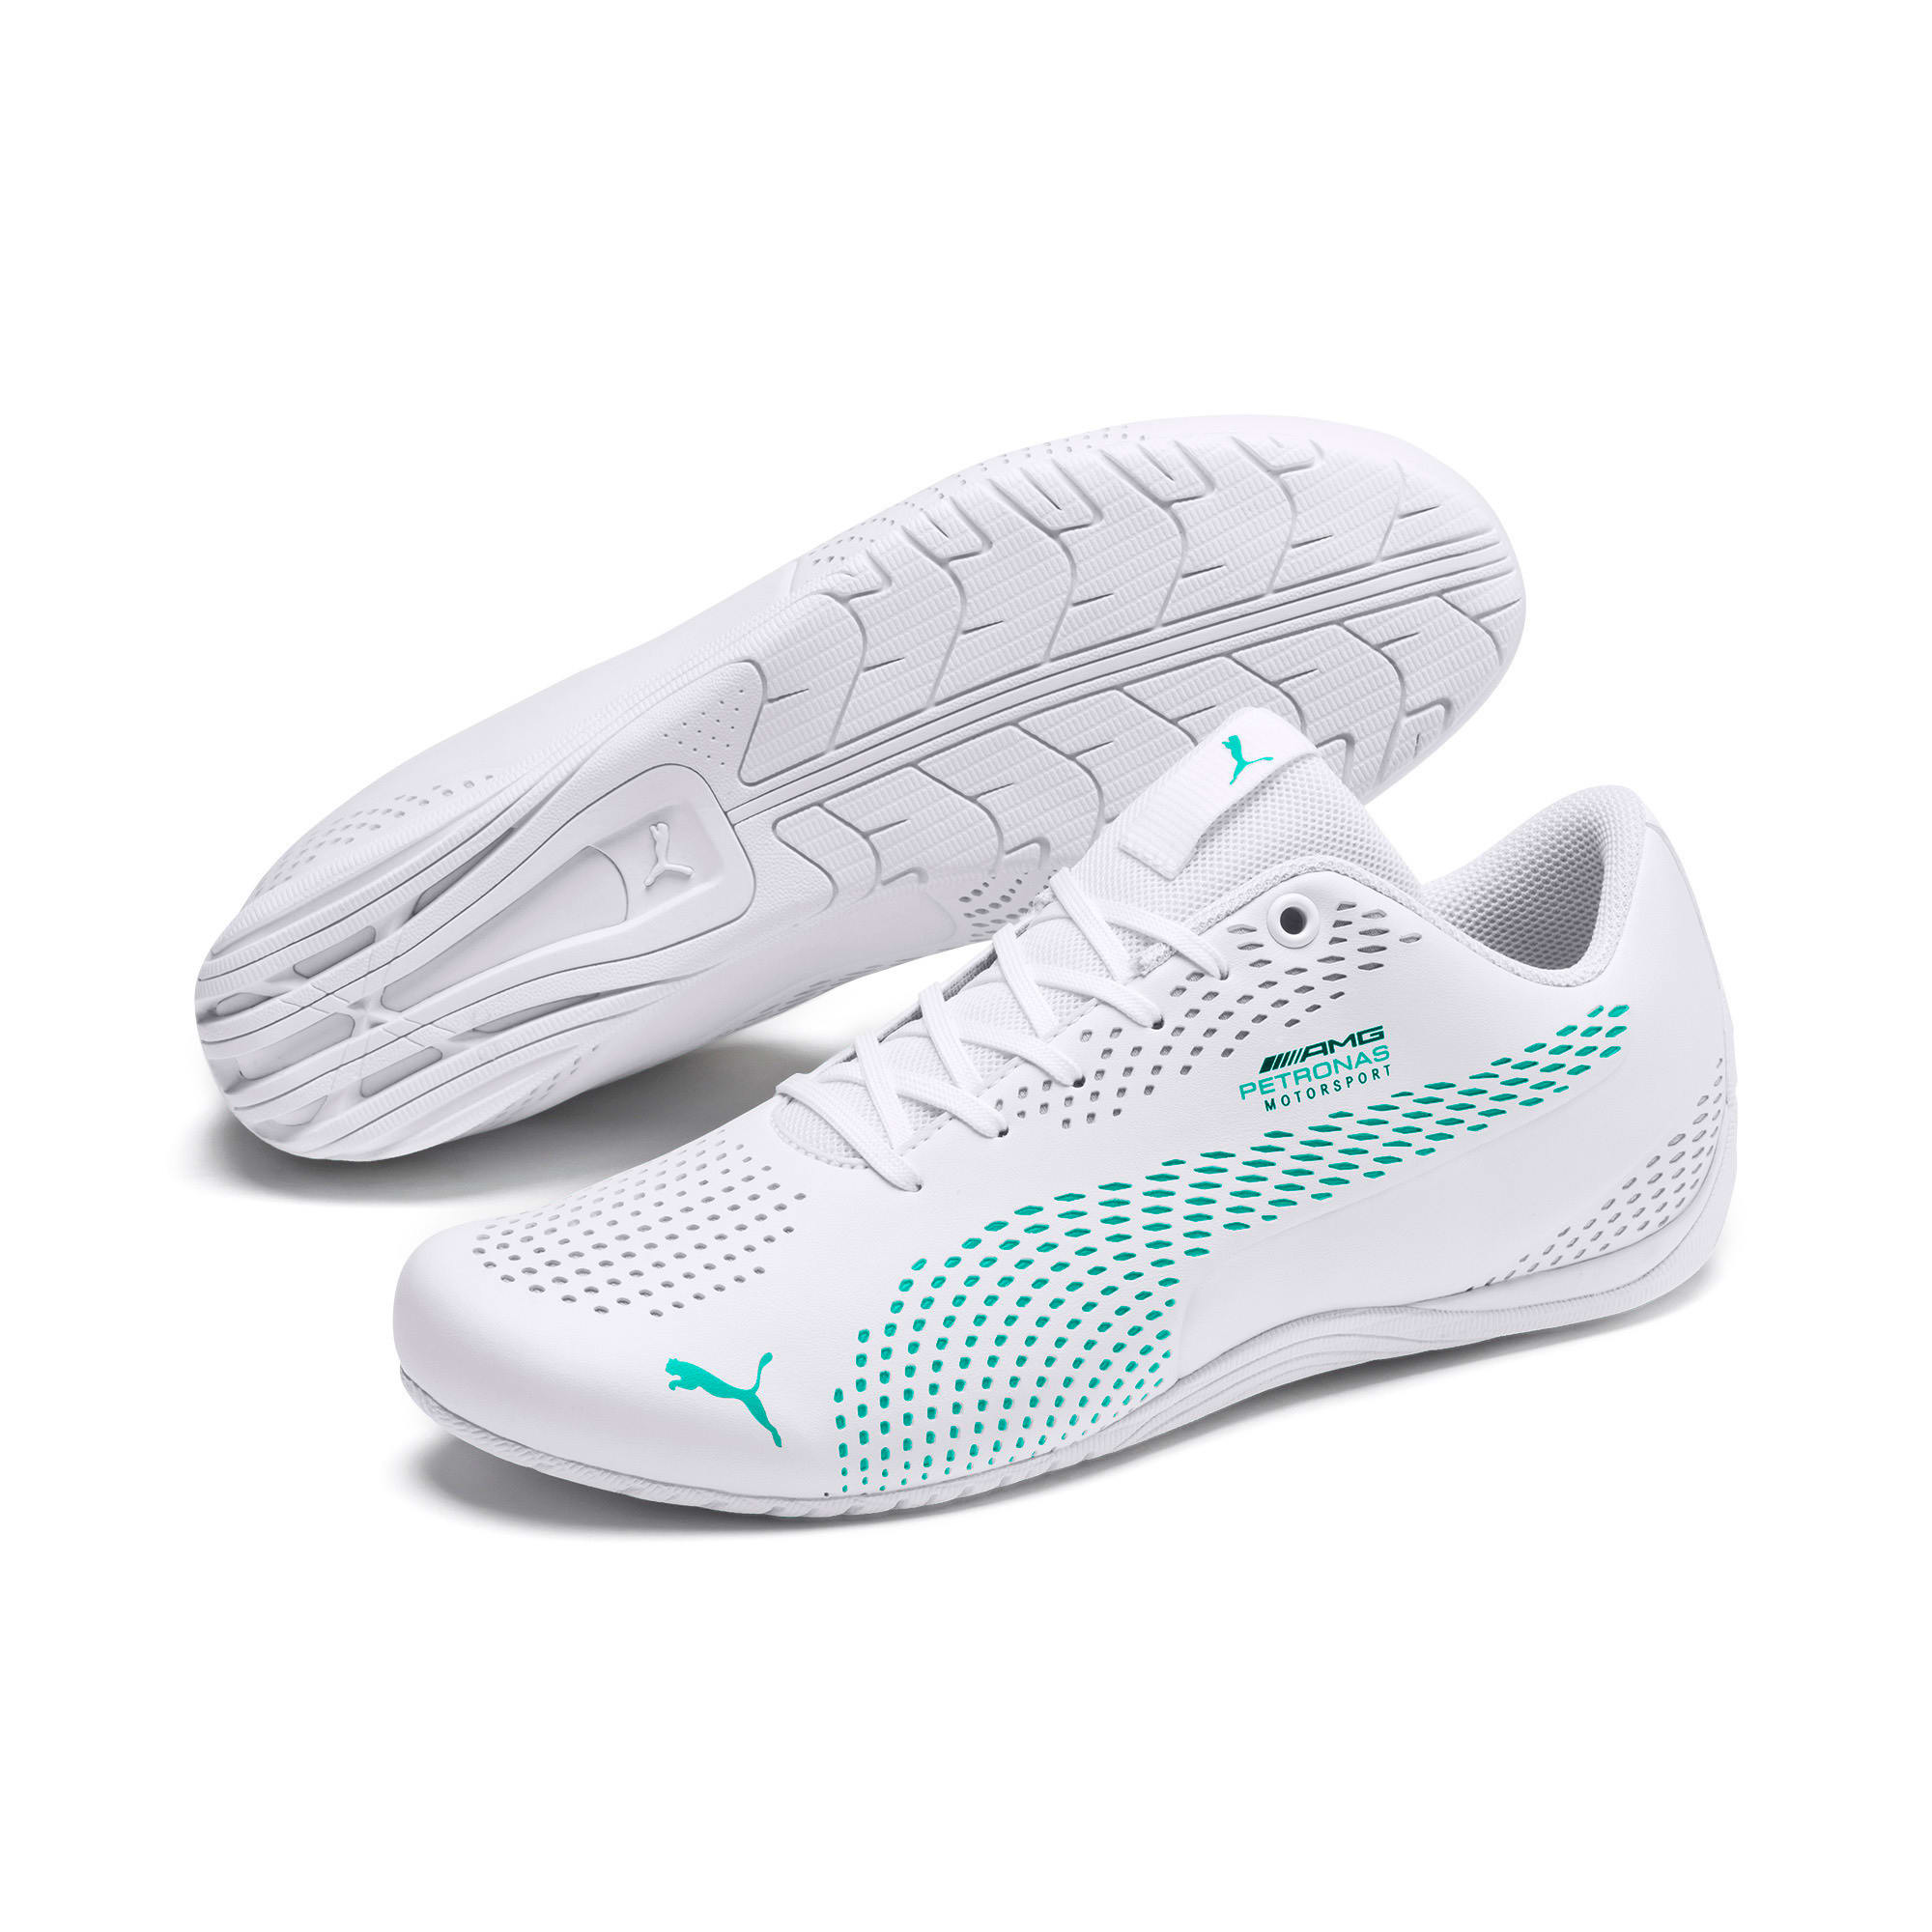 Miniatura 3 de Zapatos Mercedes AMG Petronas Drift Cat 5 Ultra II, Puma White-Spectra Green, mediano